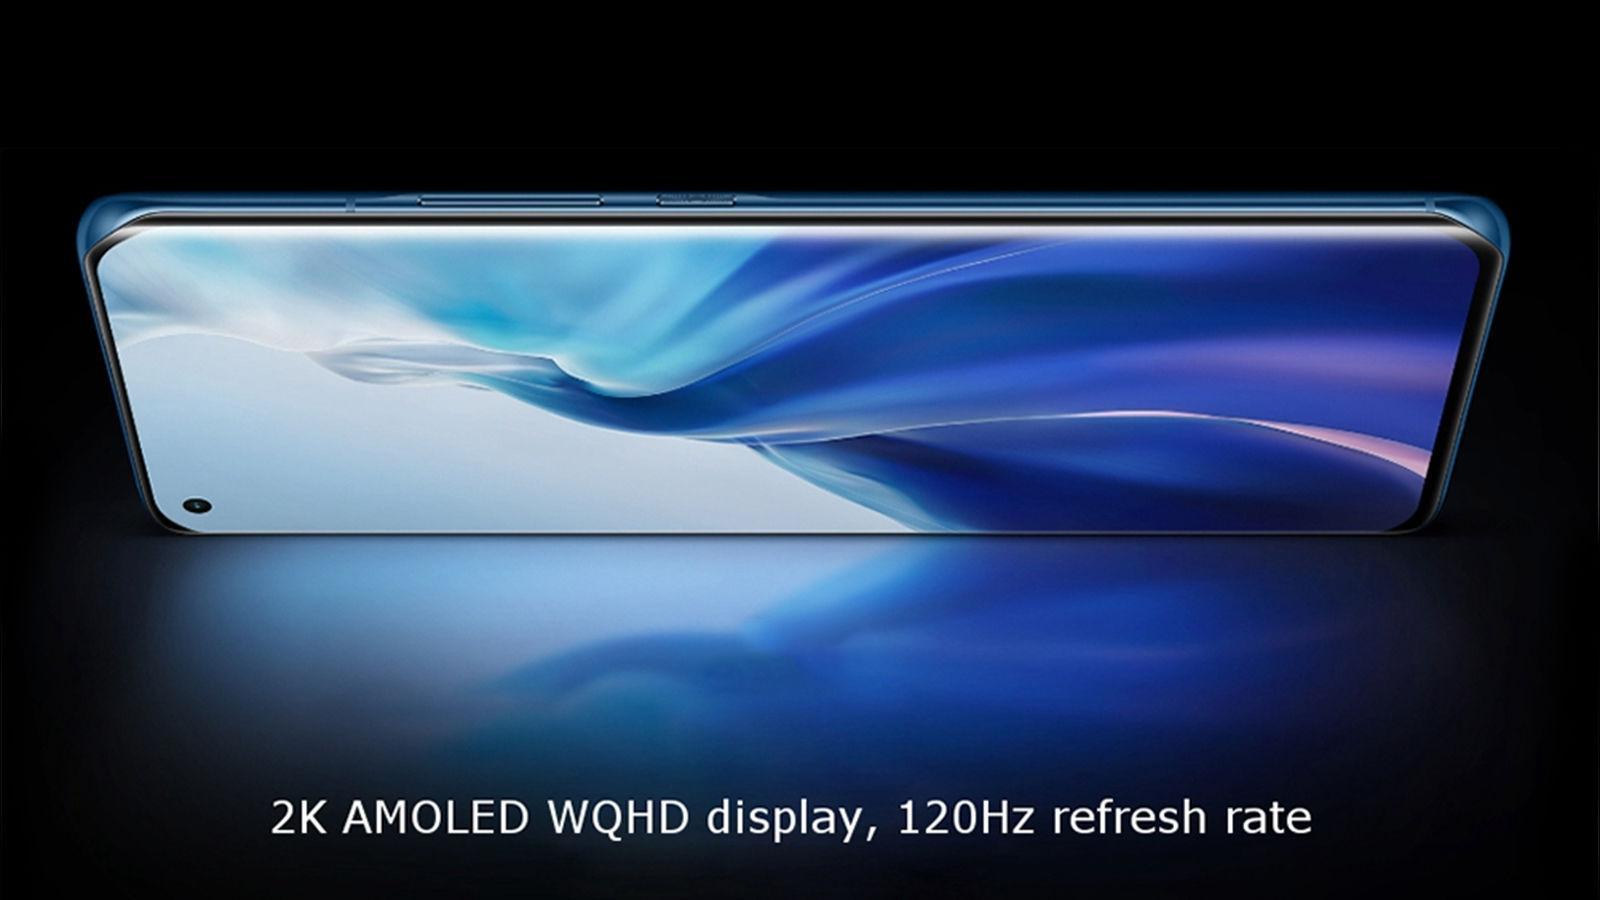 Where to buy Xiaomi Mi 11 display